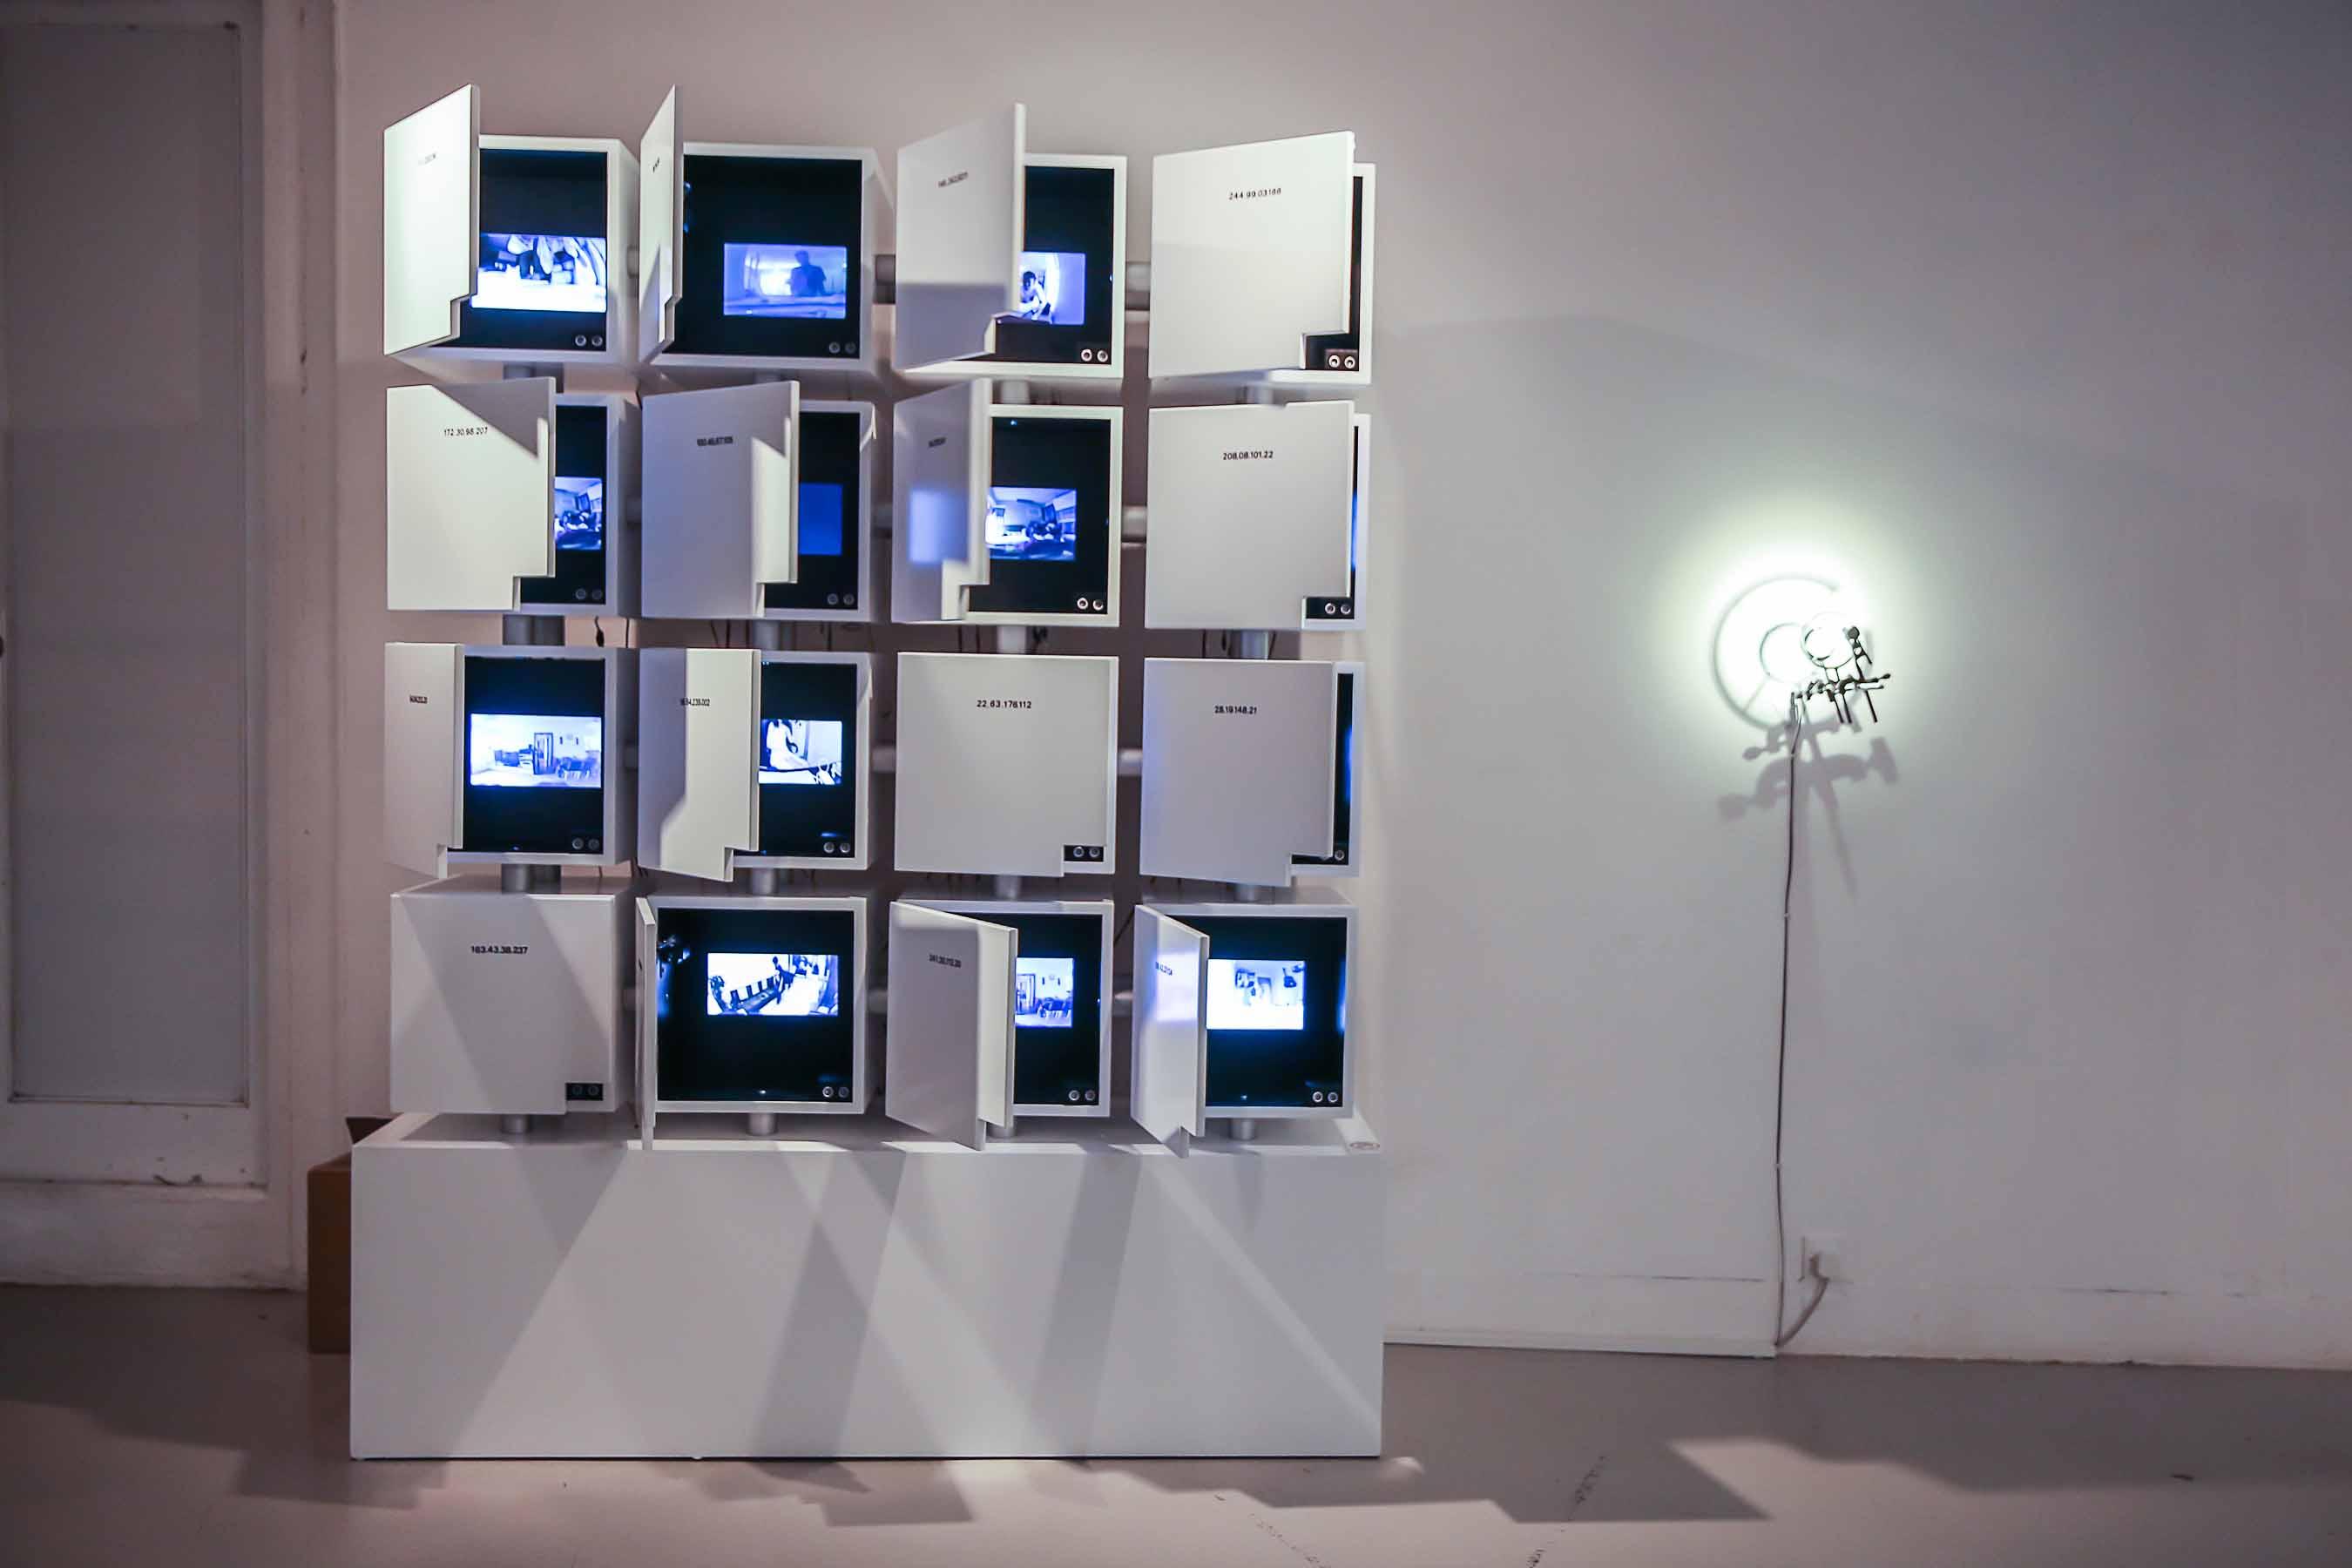 <i>Bring To Light</i> by Lai Ka-yiu Ruck, Mau Kai-chau, Chan Chong-tat, Kan Ho-fai, Lam Cheuk-hin and Leung Kin-hung (Hong Kong)